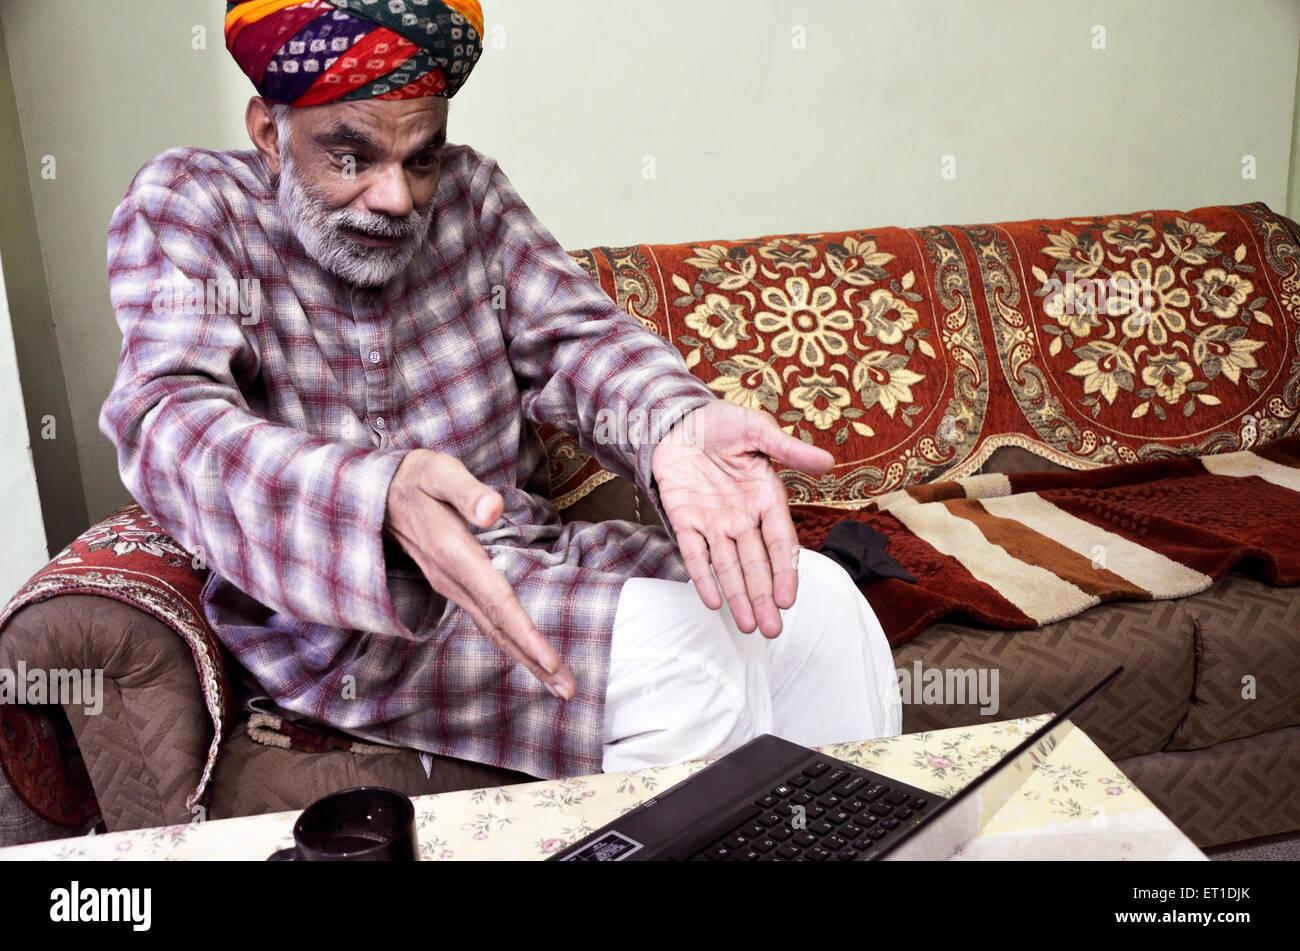 L'expression Surprise de l'homme MR#704 Jodhpur Rajasthan Inde Asie Photo Stock